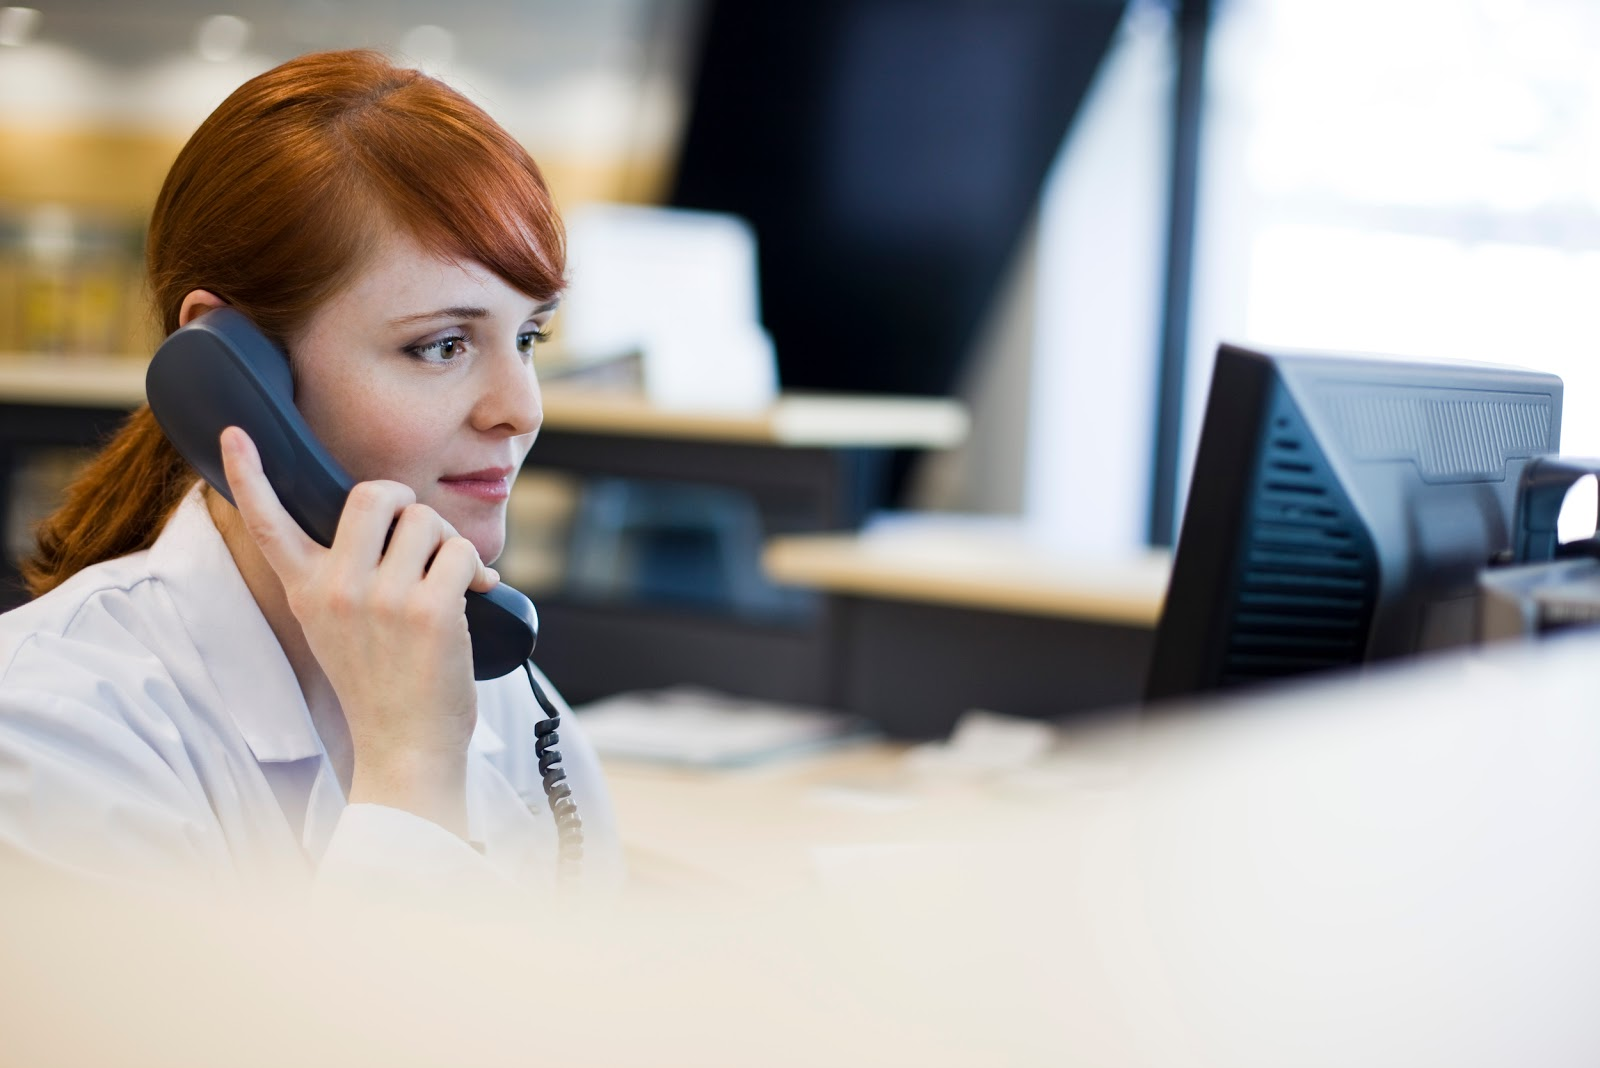 female receptionist jobs in haridwar uttarakhand at demitsol